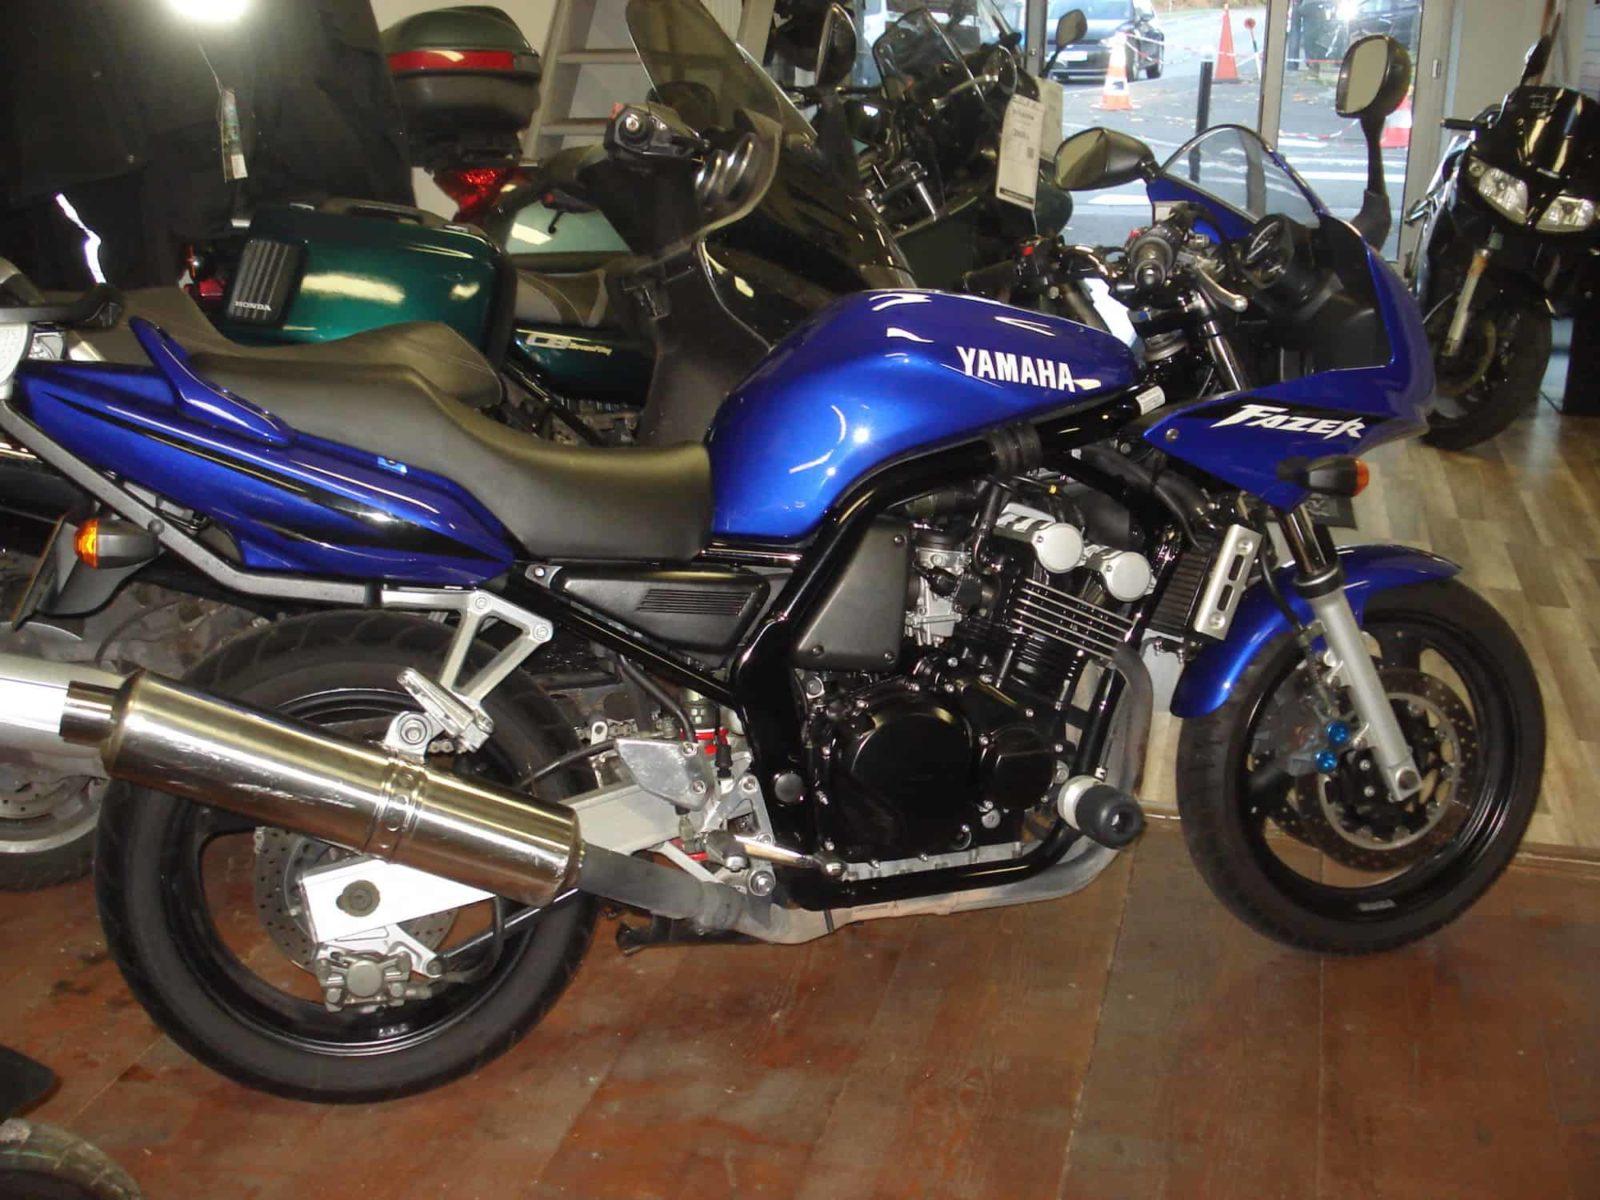 Vendu ! Yamaha FZS Fazer – 2500€